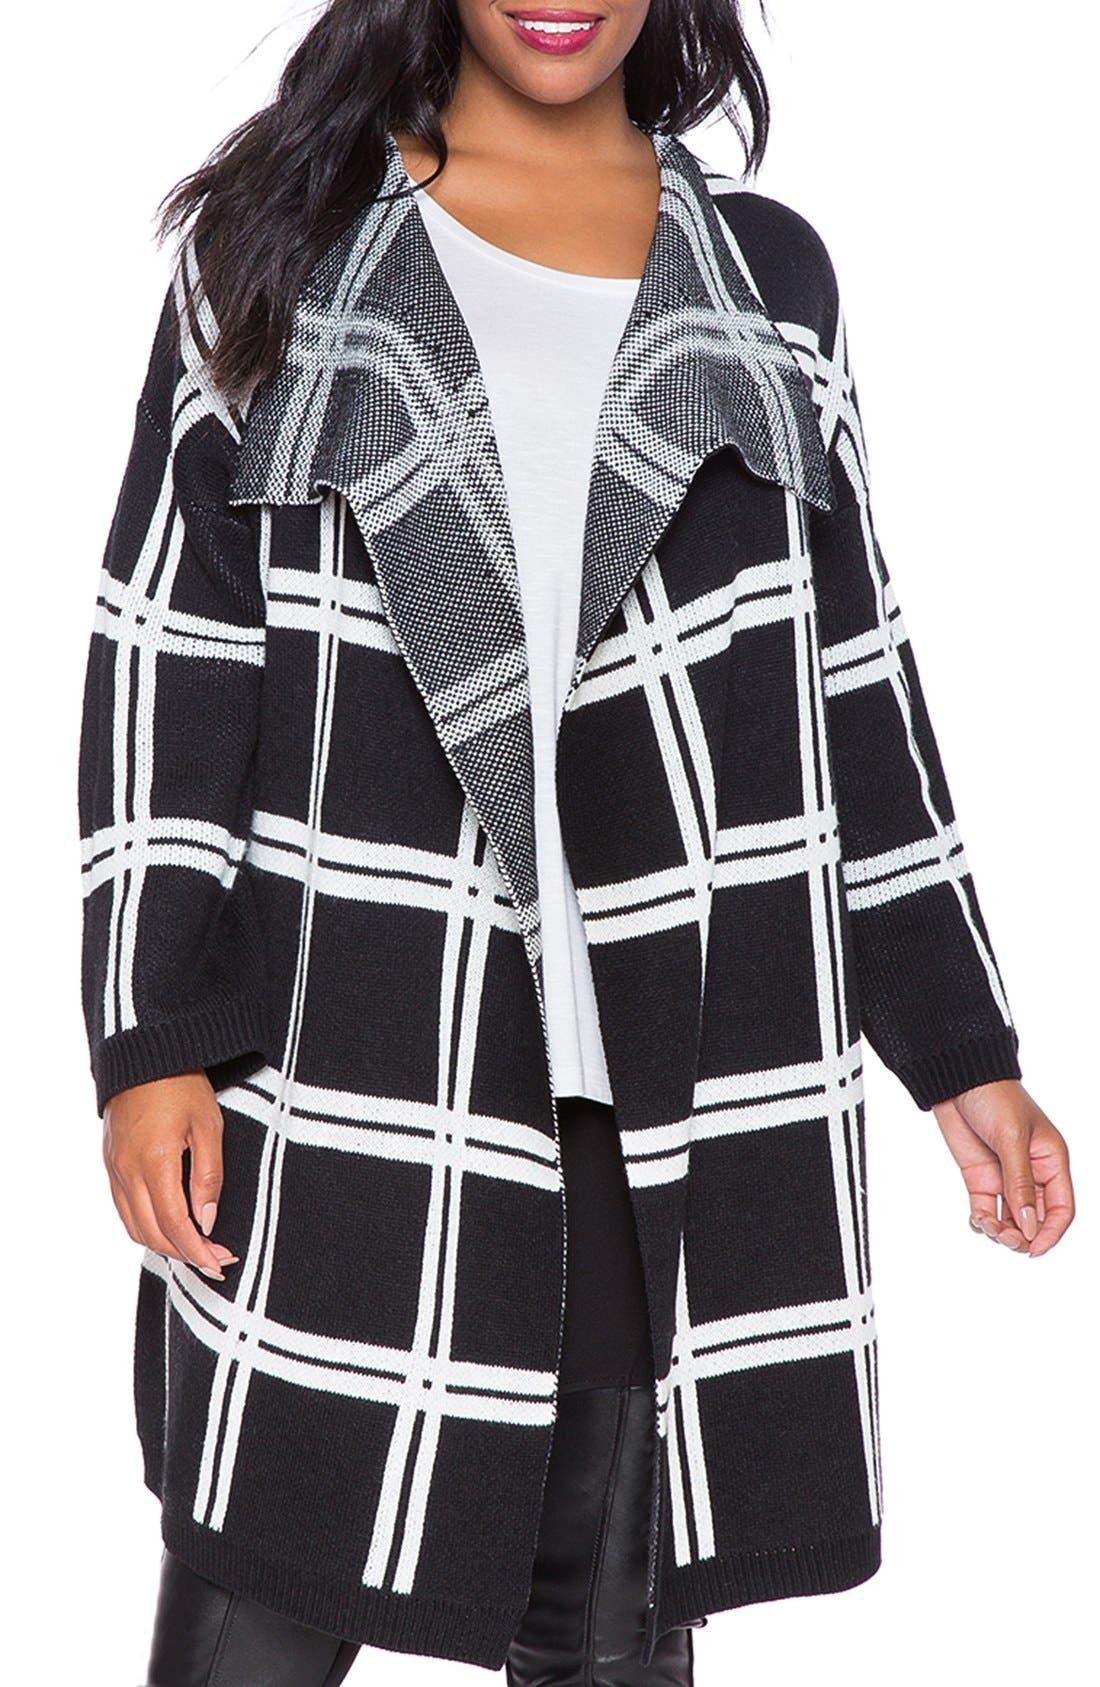 Windowpane Print Oversize Cardigan,                         Main,                         color, Black With White